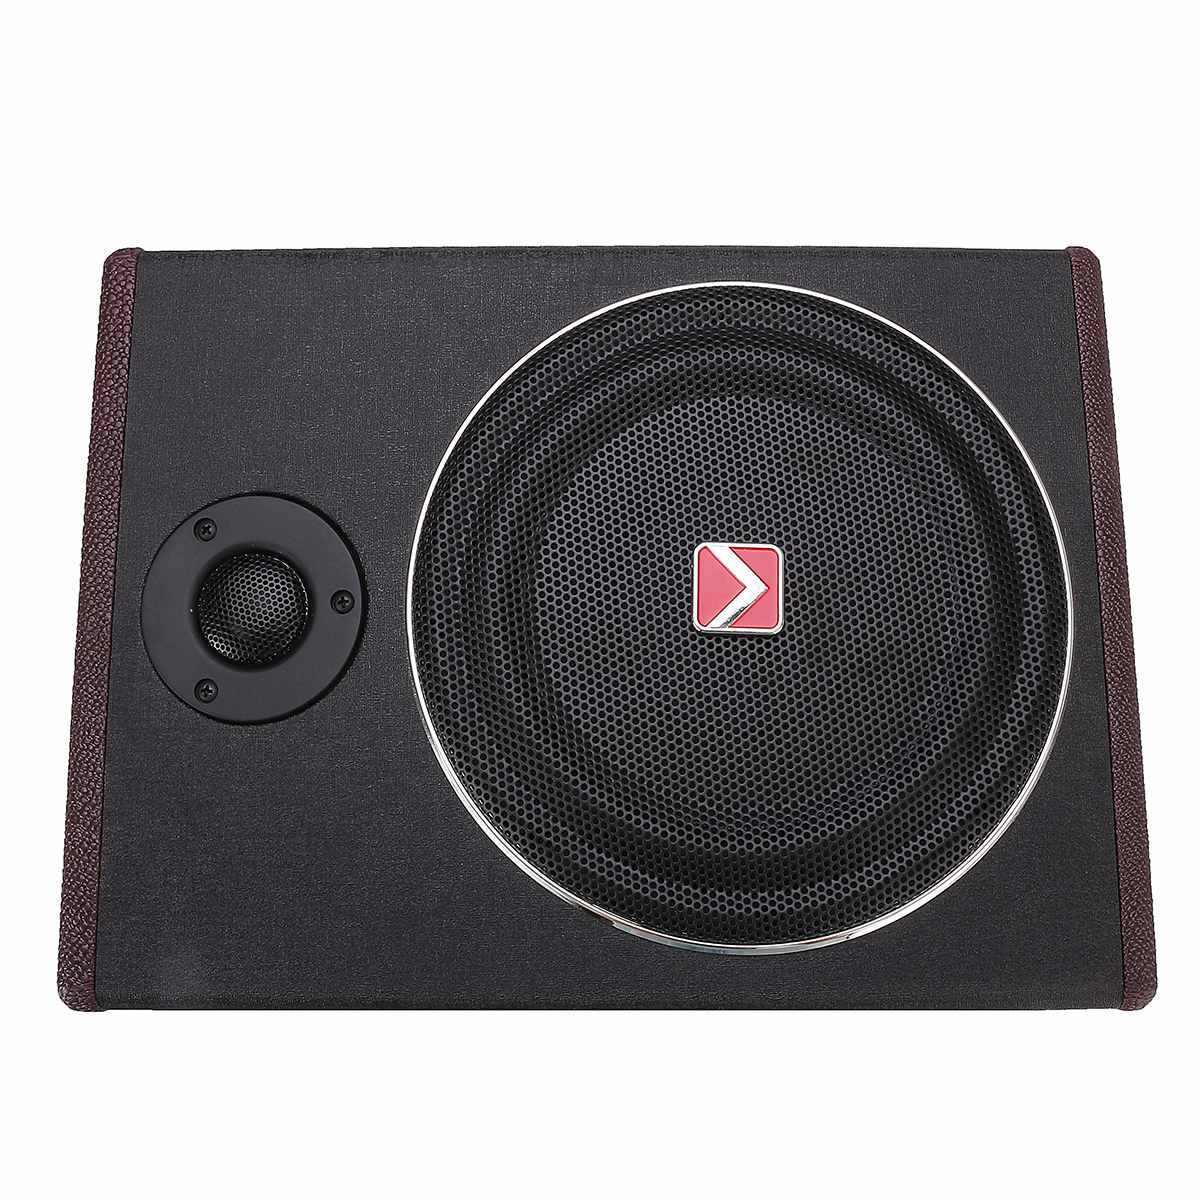 8 Inch 600W Car Subwoofers Car Amplifier Subwoofers Car Speaker Active Subwoofer Car Under Seat Slim Sub Woofer AMP Super Bass